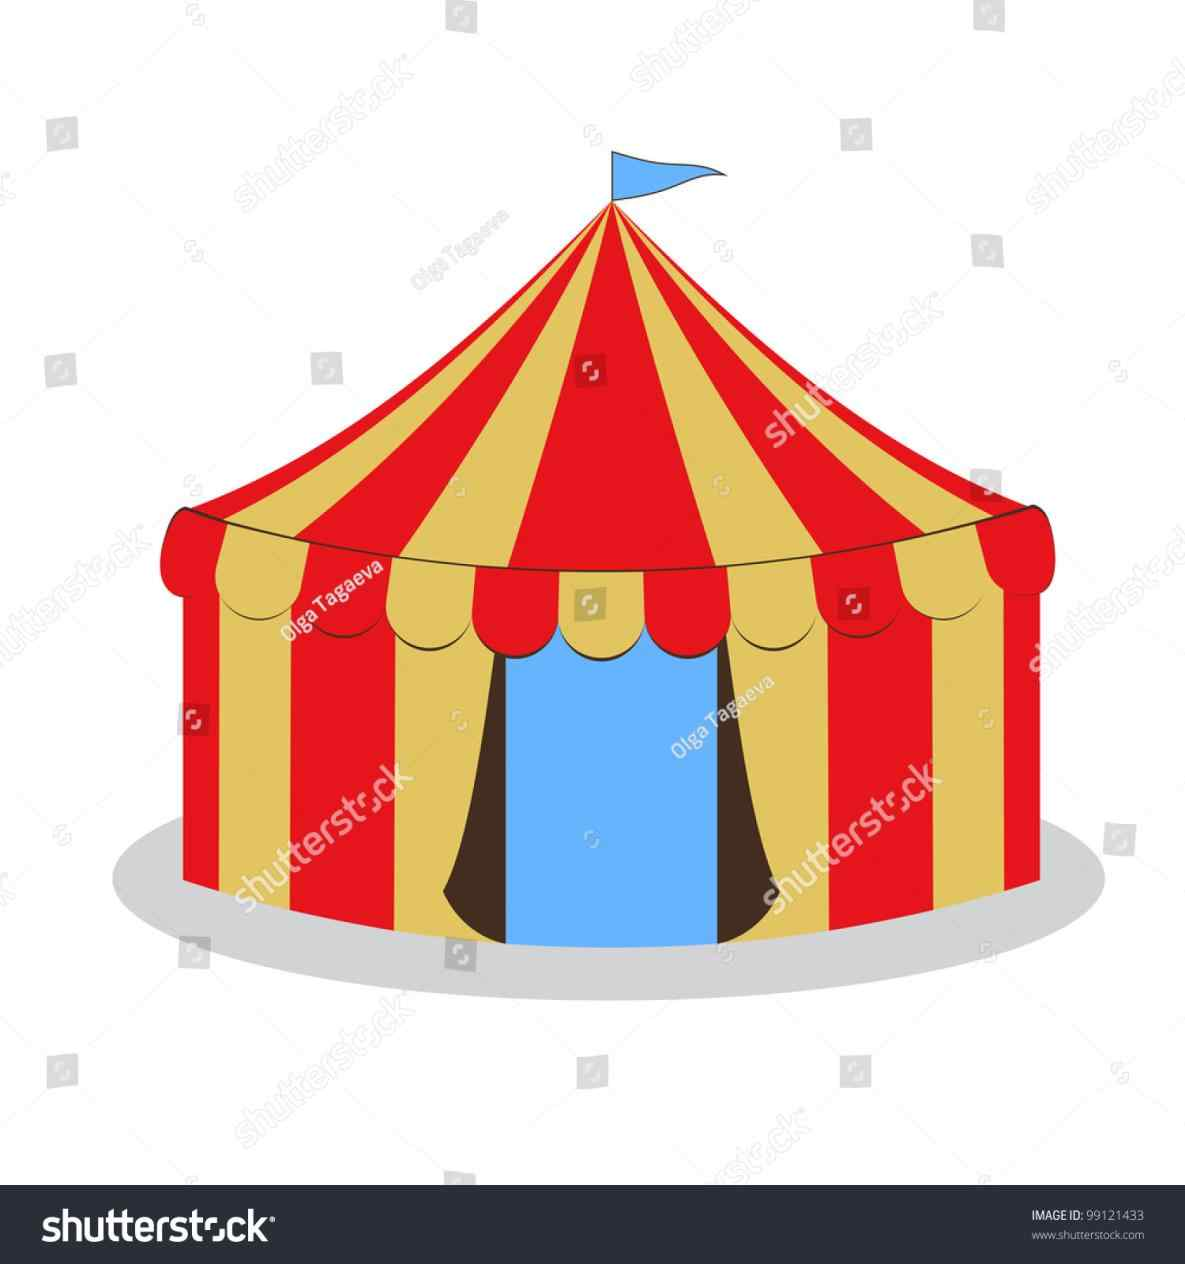 1185x1264 Circus Tents Clipart